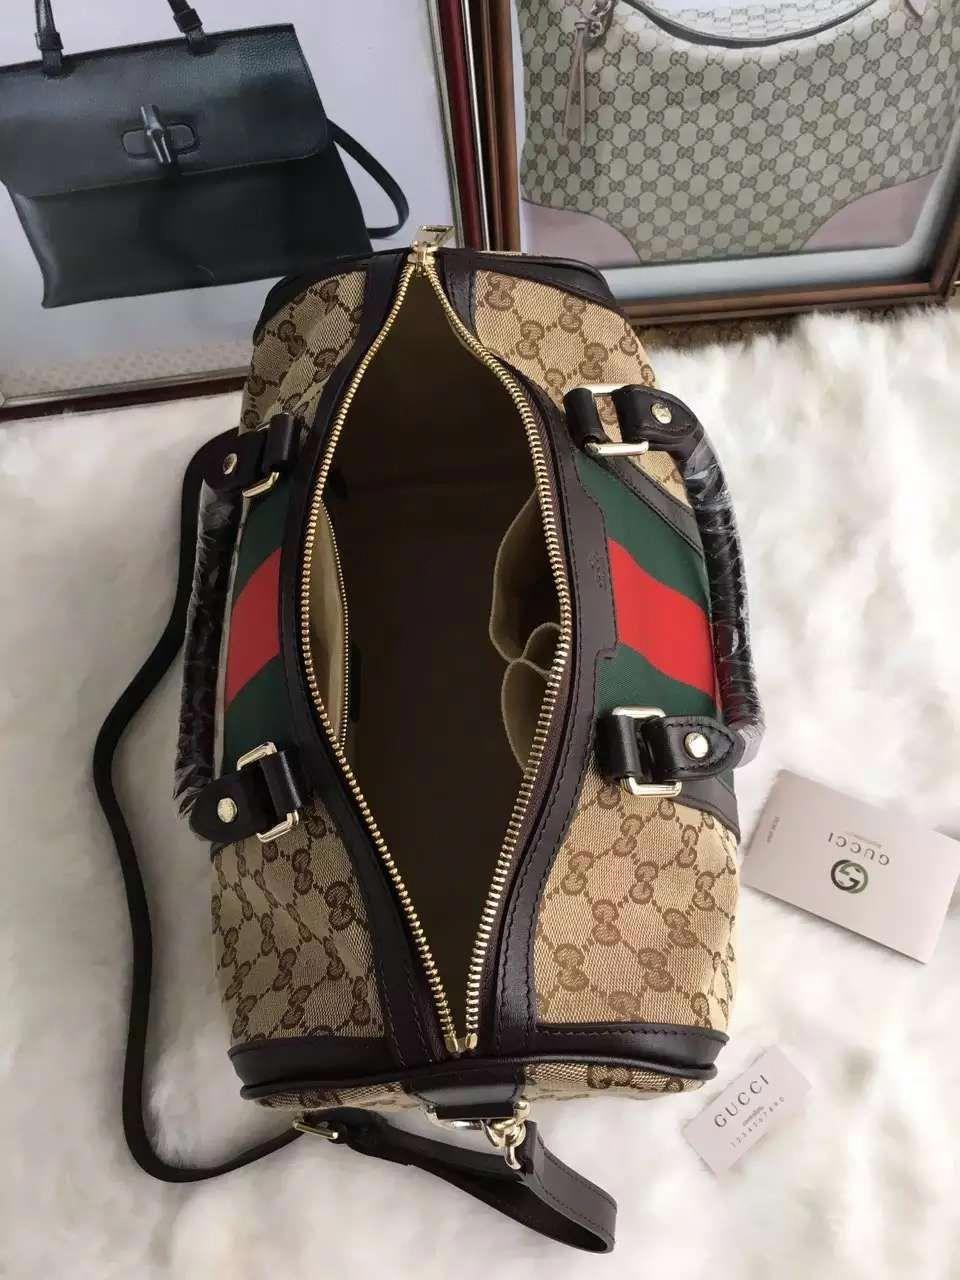 f8aa7d4c6 gucci Bag, ID : 65575(FORSALE:a@yybags.com), gucci bag backpack ...